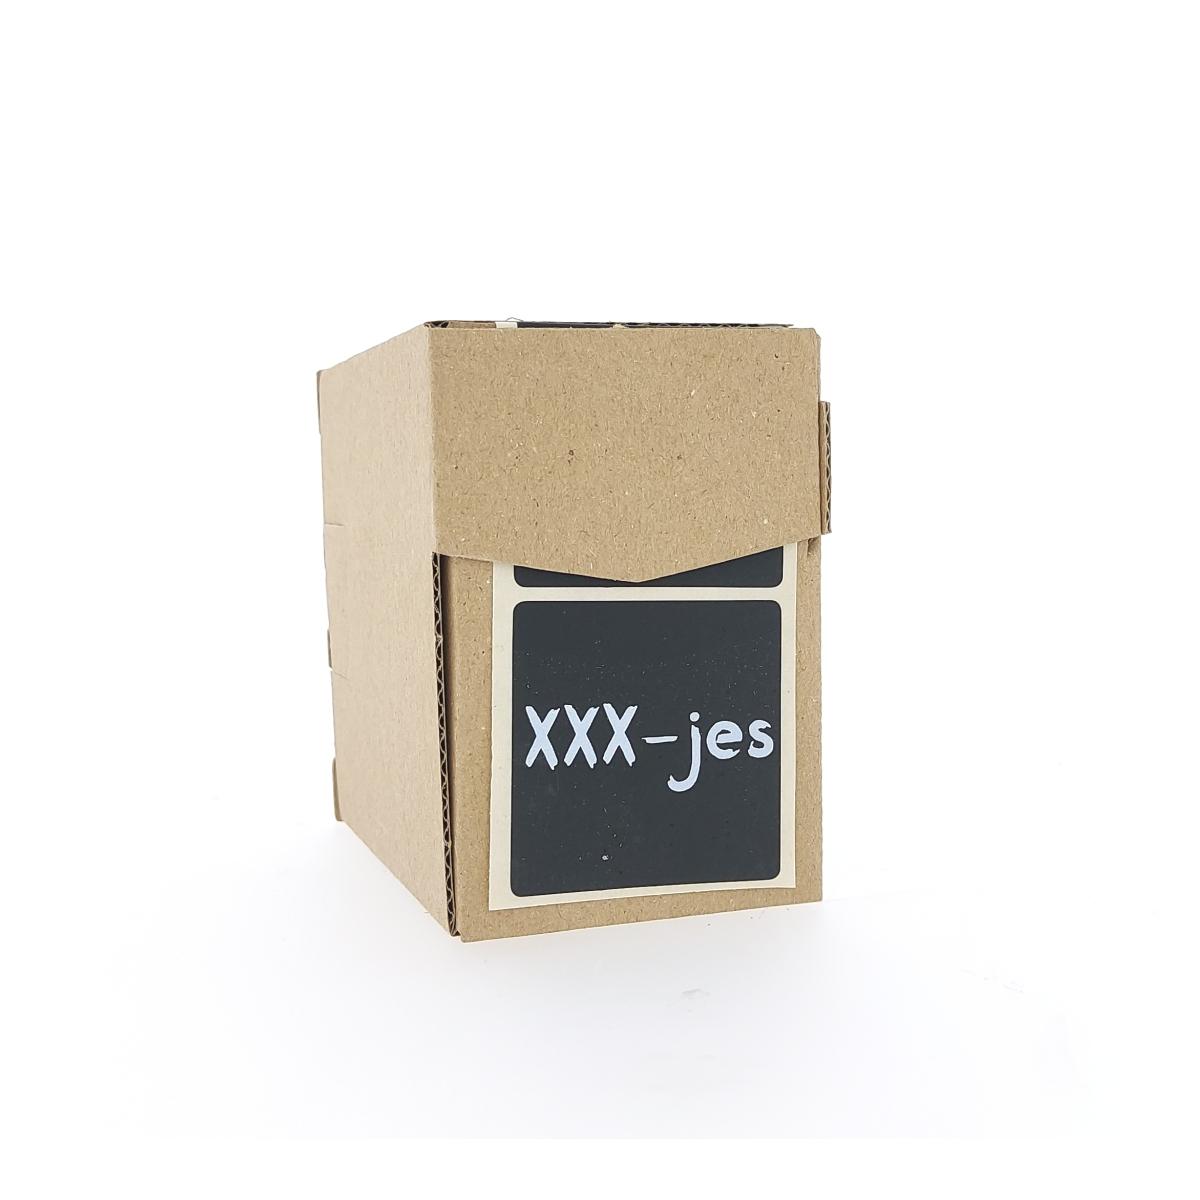 Etiketten - XXX-jes